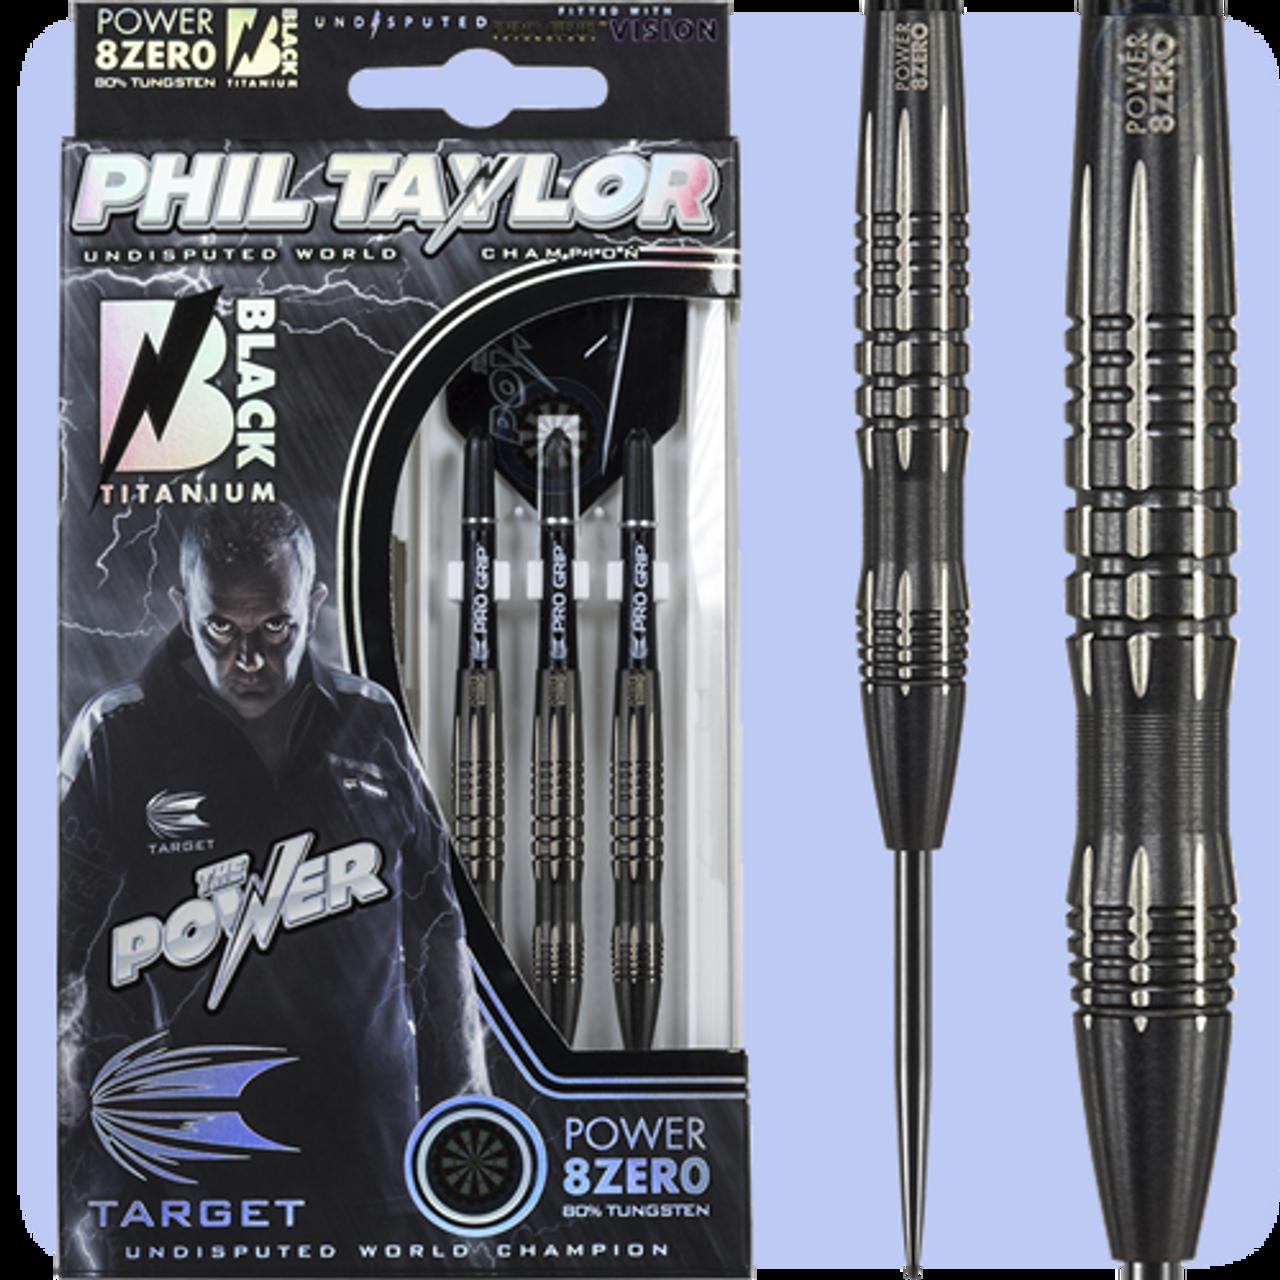 Target Darts Phil Taylor Power 8Zero Titanium Steel Tip Darts